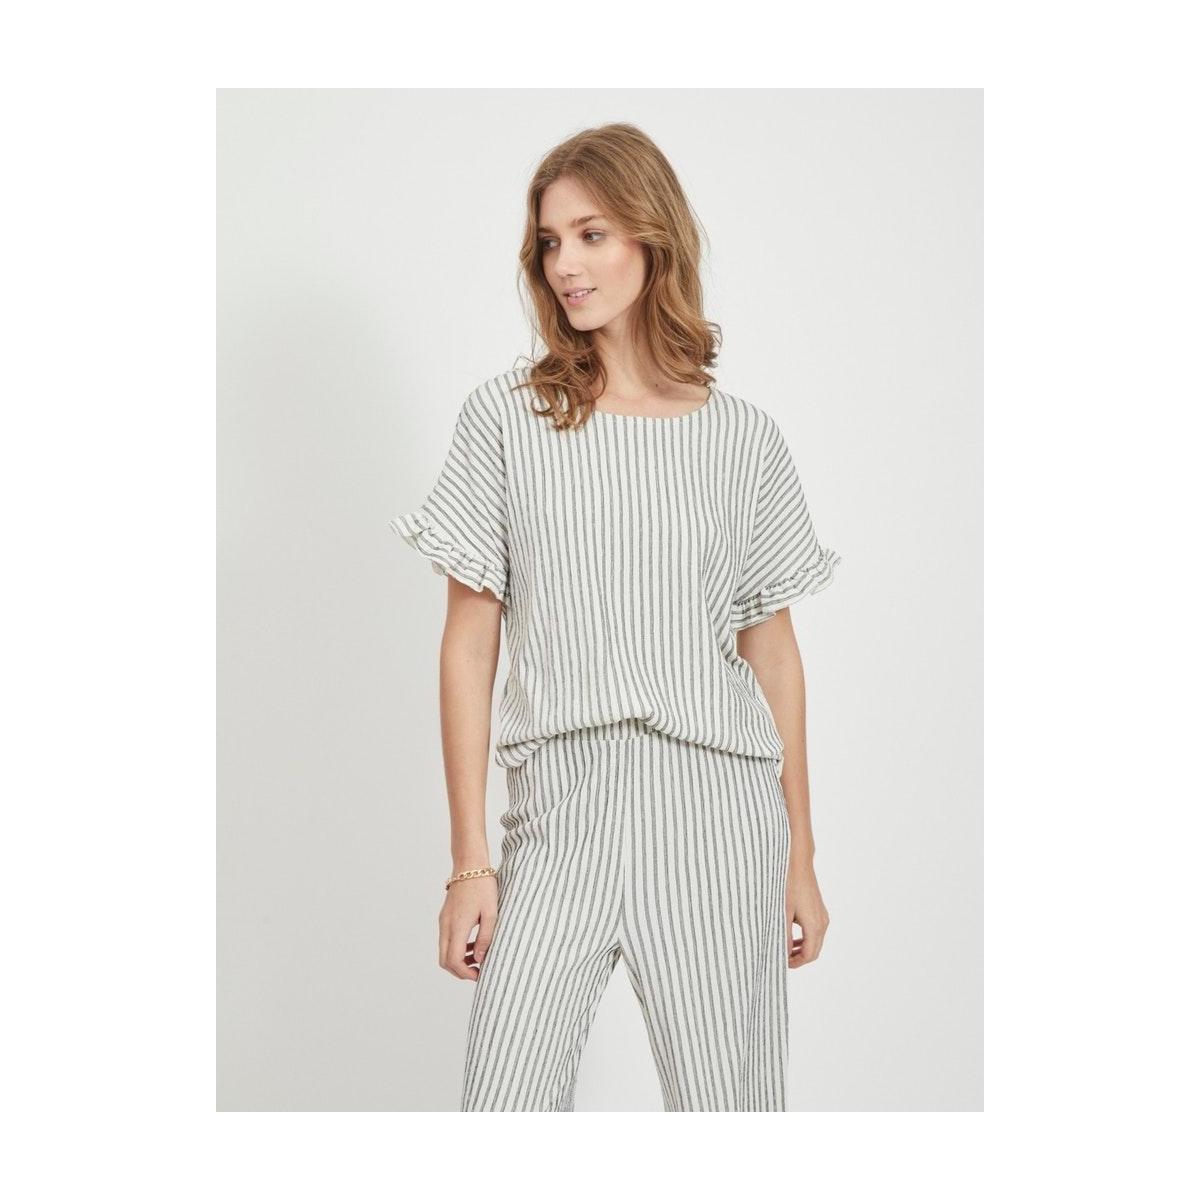 vivanilla s/s o-neck flounce top 14058602 vila t-shirt snow white/black stripes